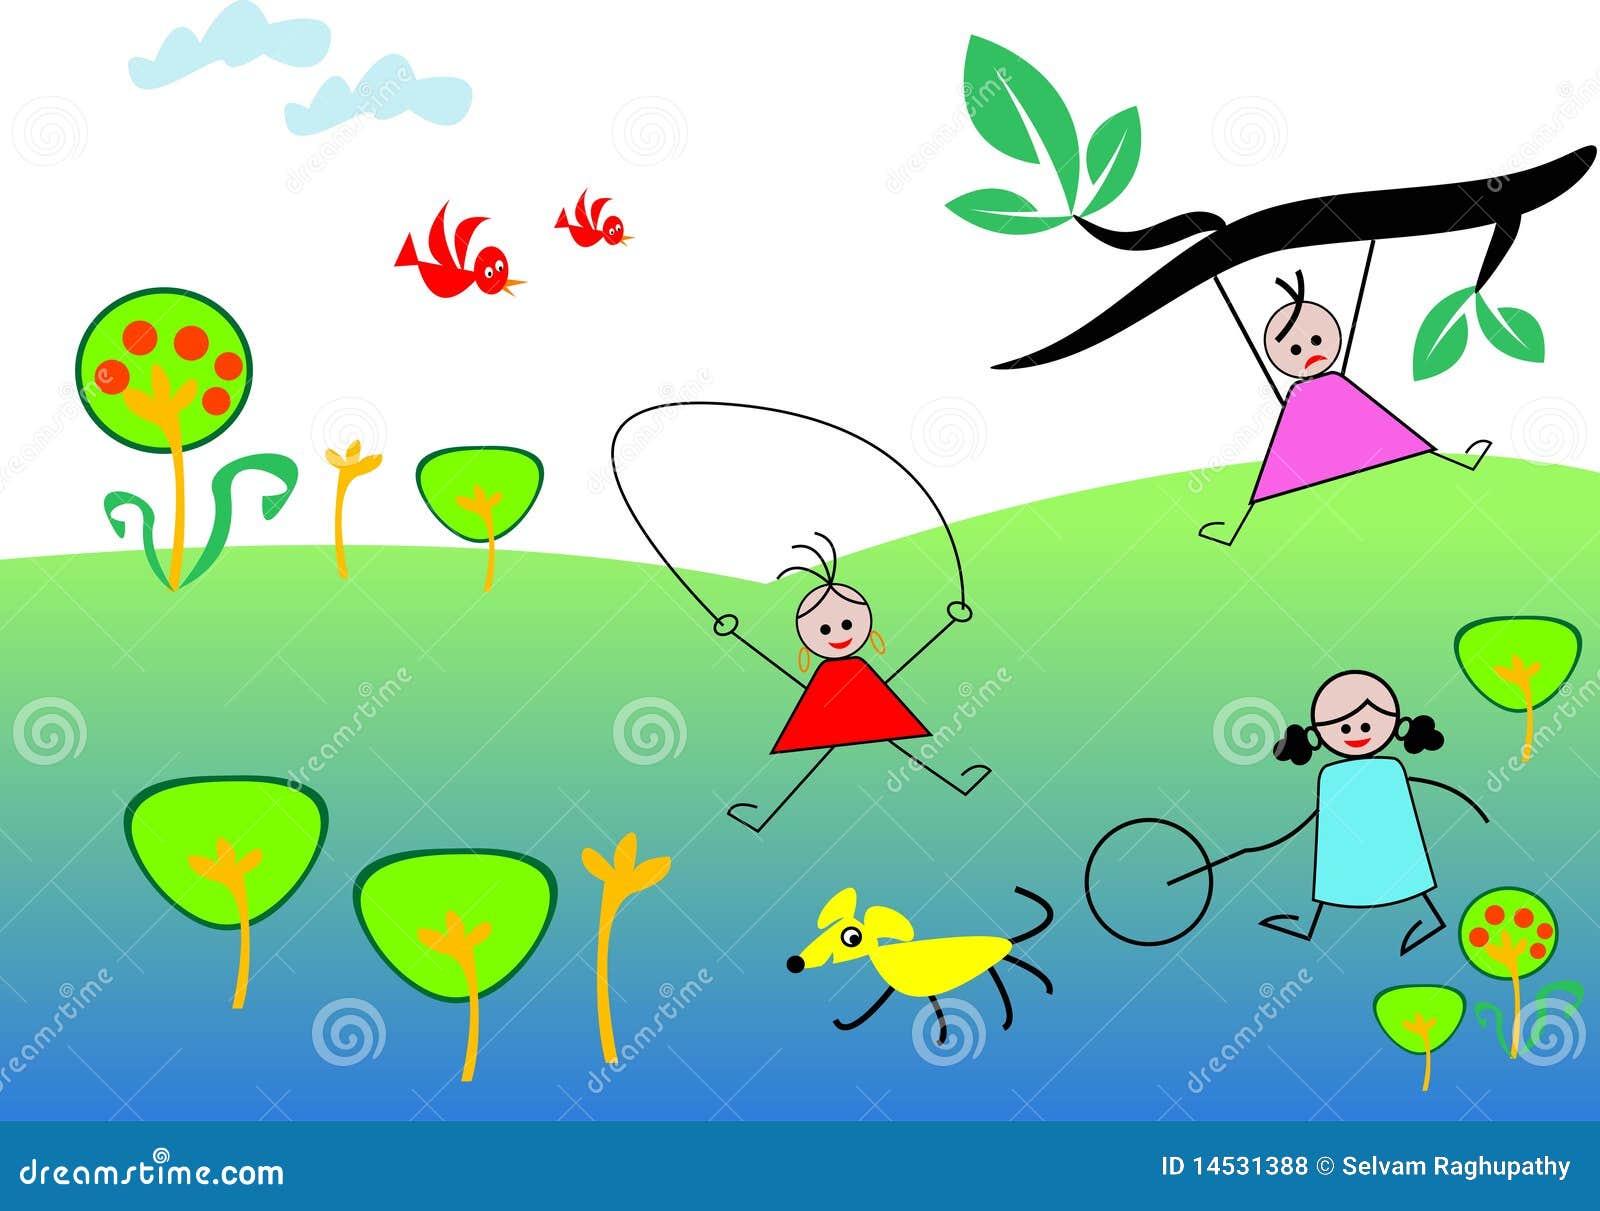 cartoon illustrated - Holiday Cartoon Images